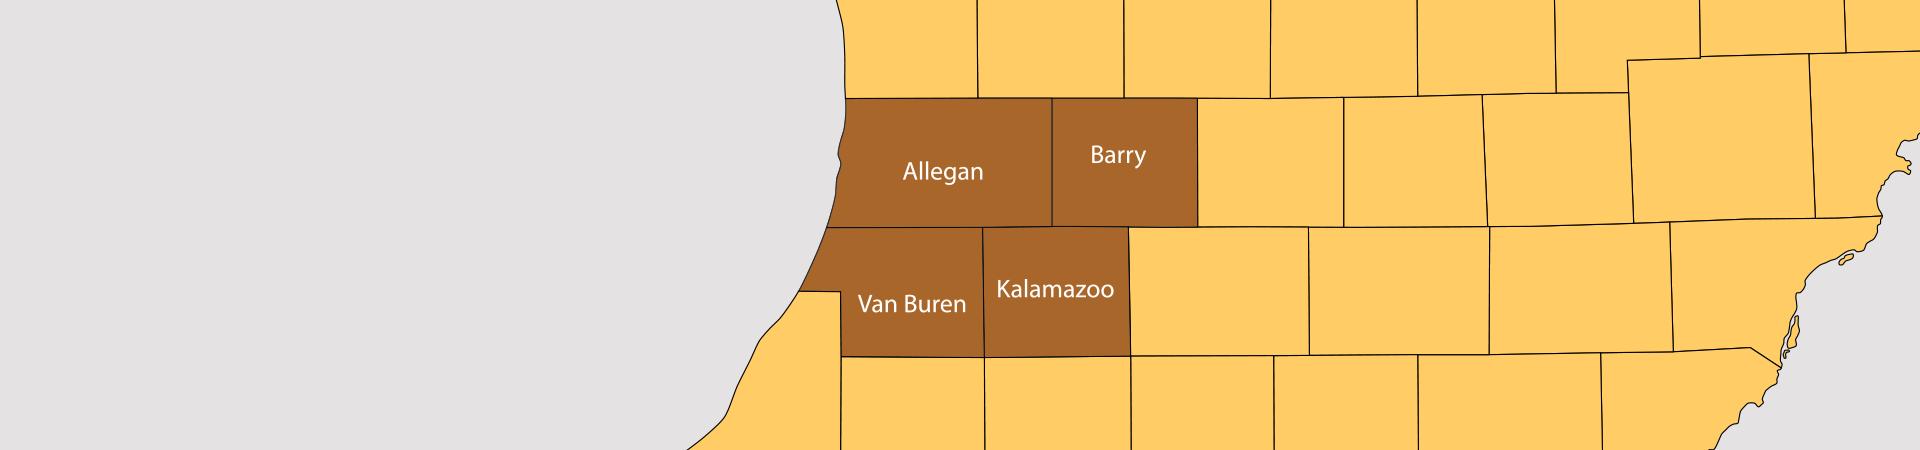 Wray's Septic Tank & Development Co.-Service area map